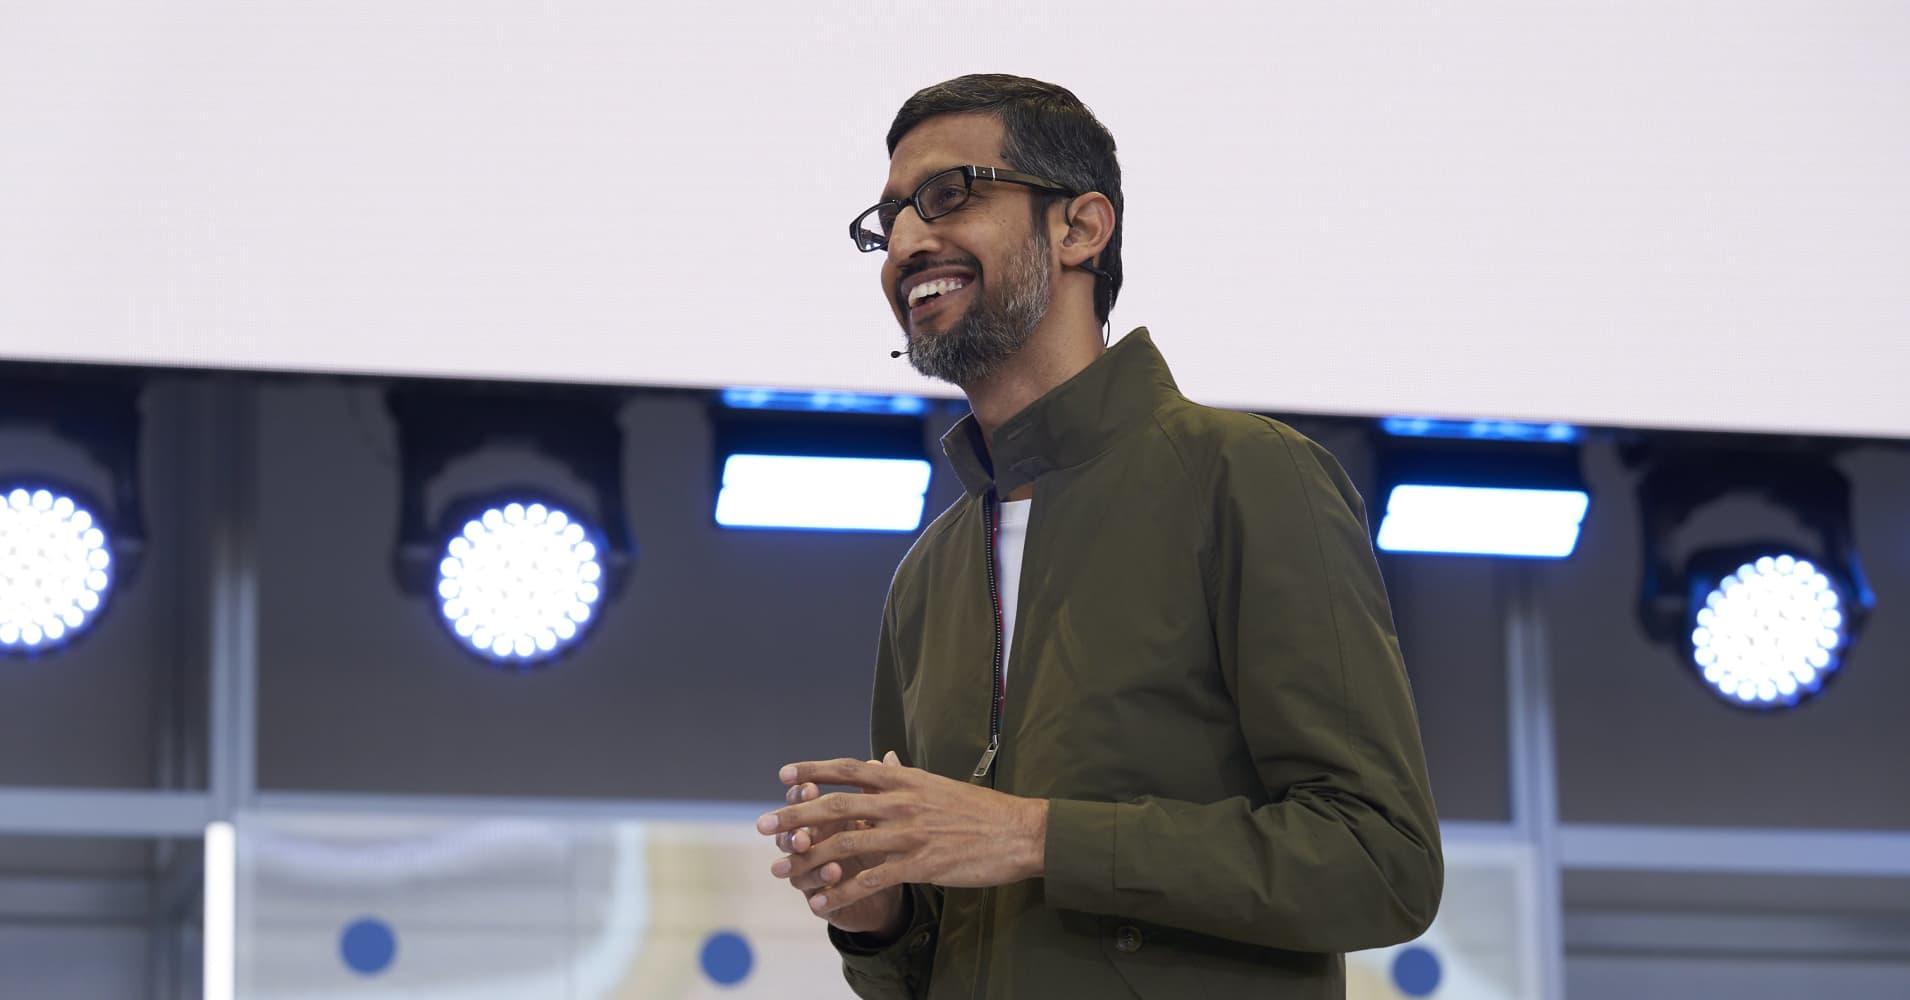 Google's flashy A.I. demo overshadowed Microsoft's focus on work